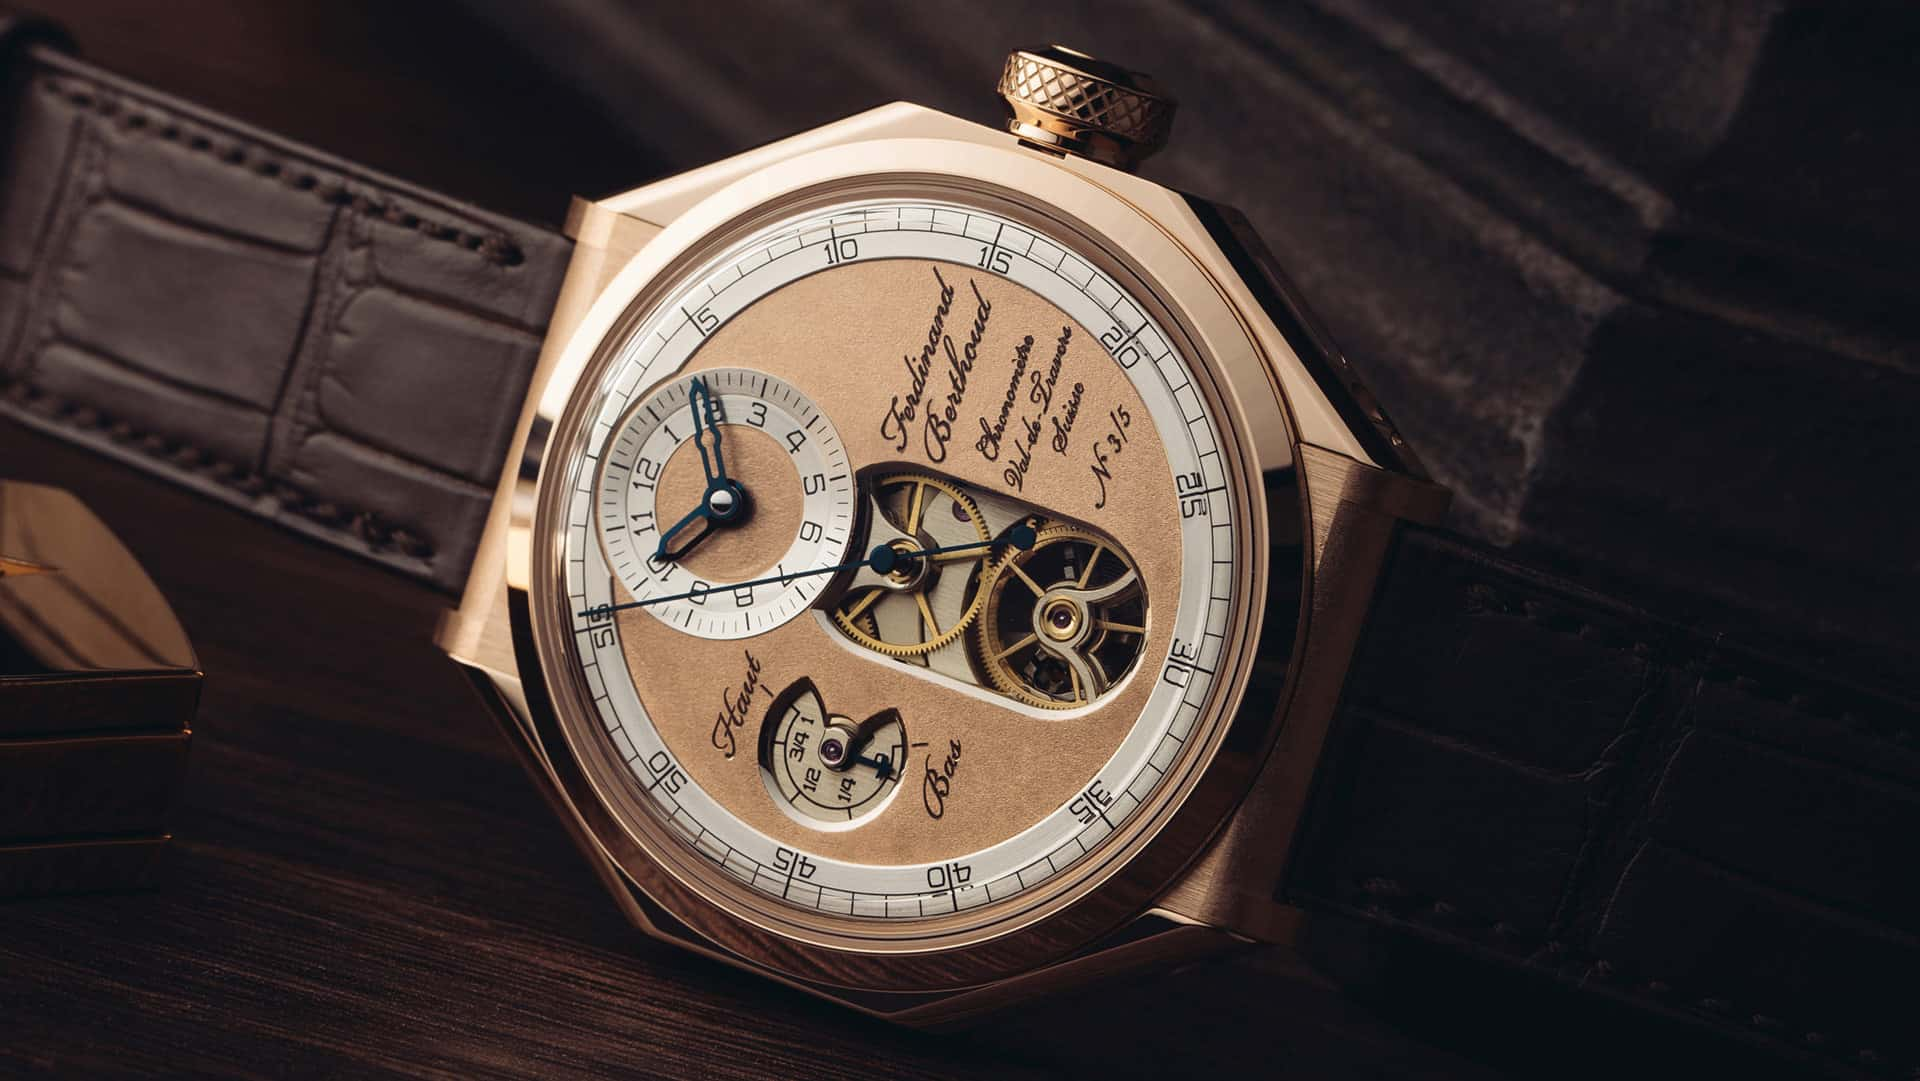 Ferdinand-Berthoud-Chronometre-FB-1-Oeuvre-D-Or-6